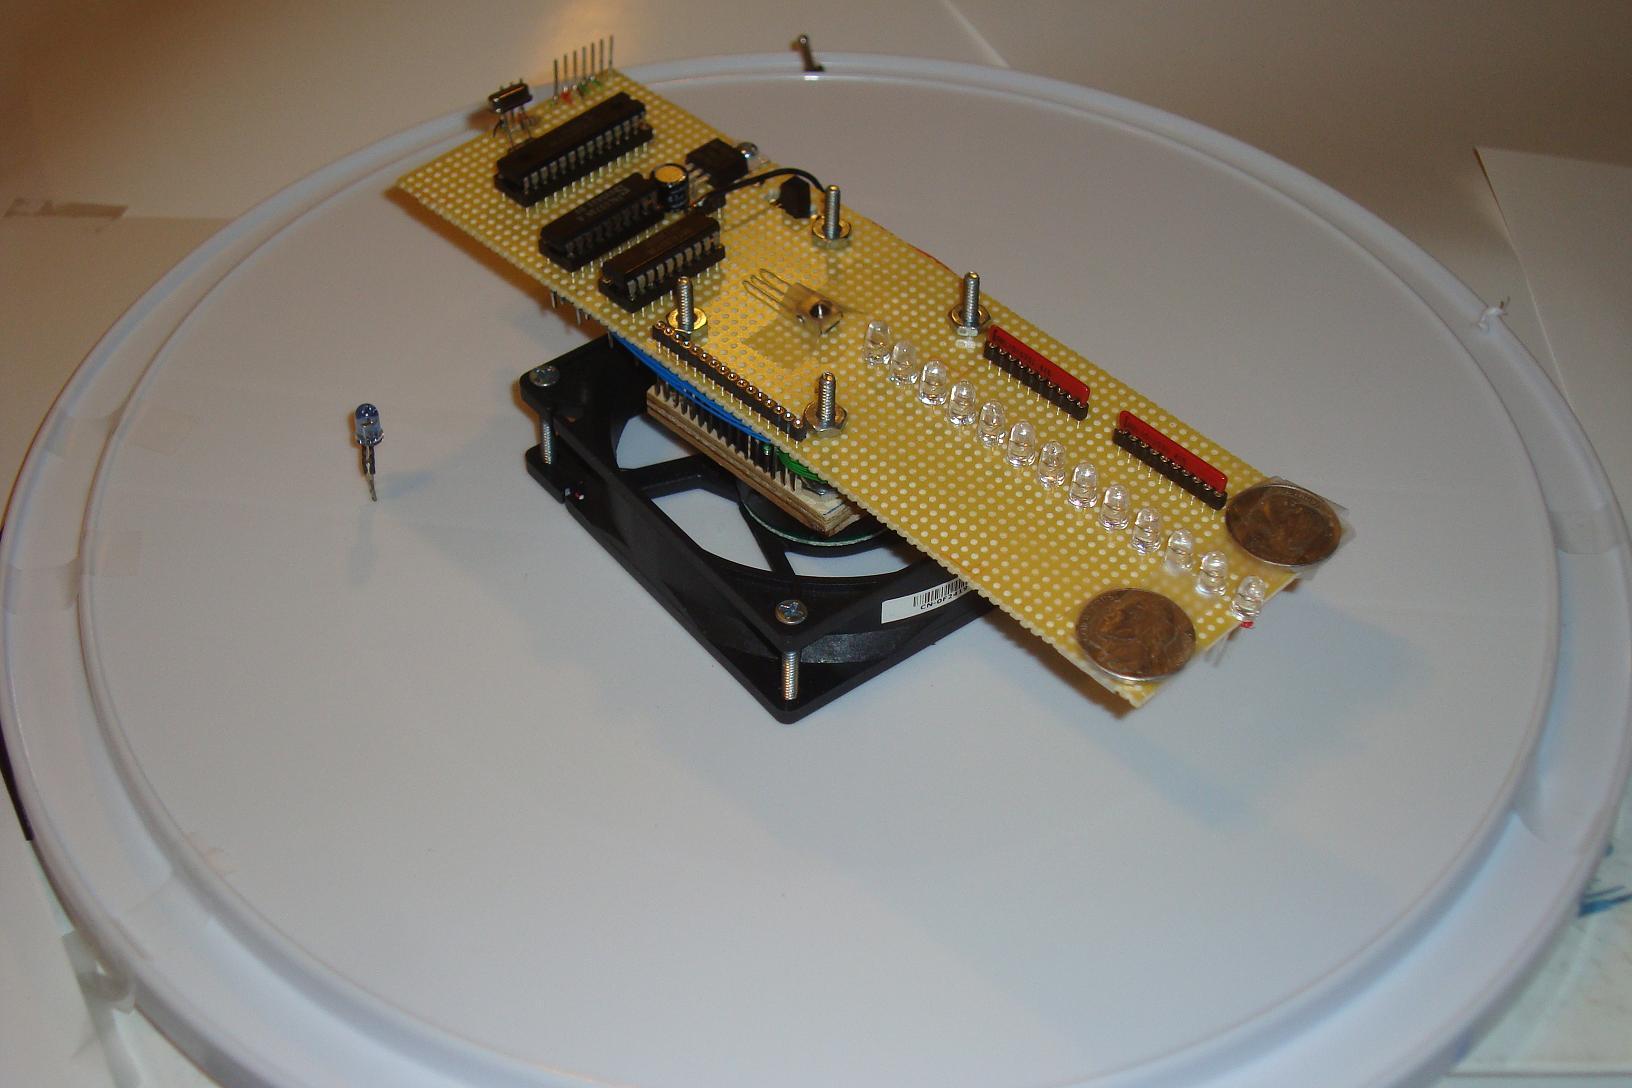 Propeller Clock Kit : Pyro propeller clock pov introduction pyroelectro